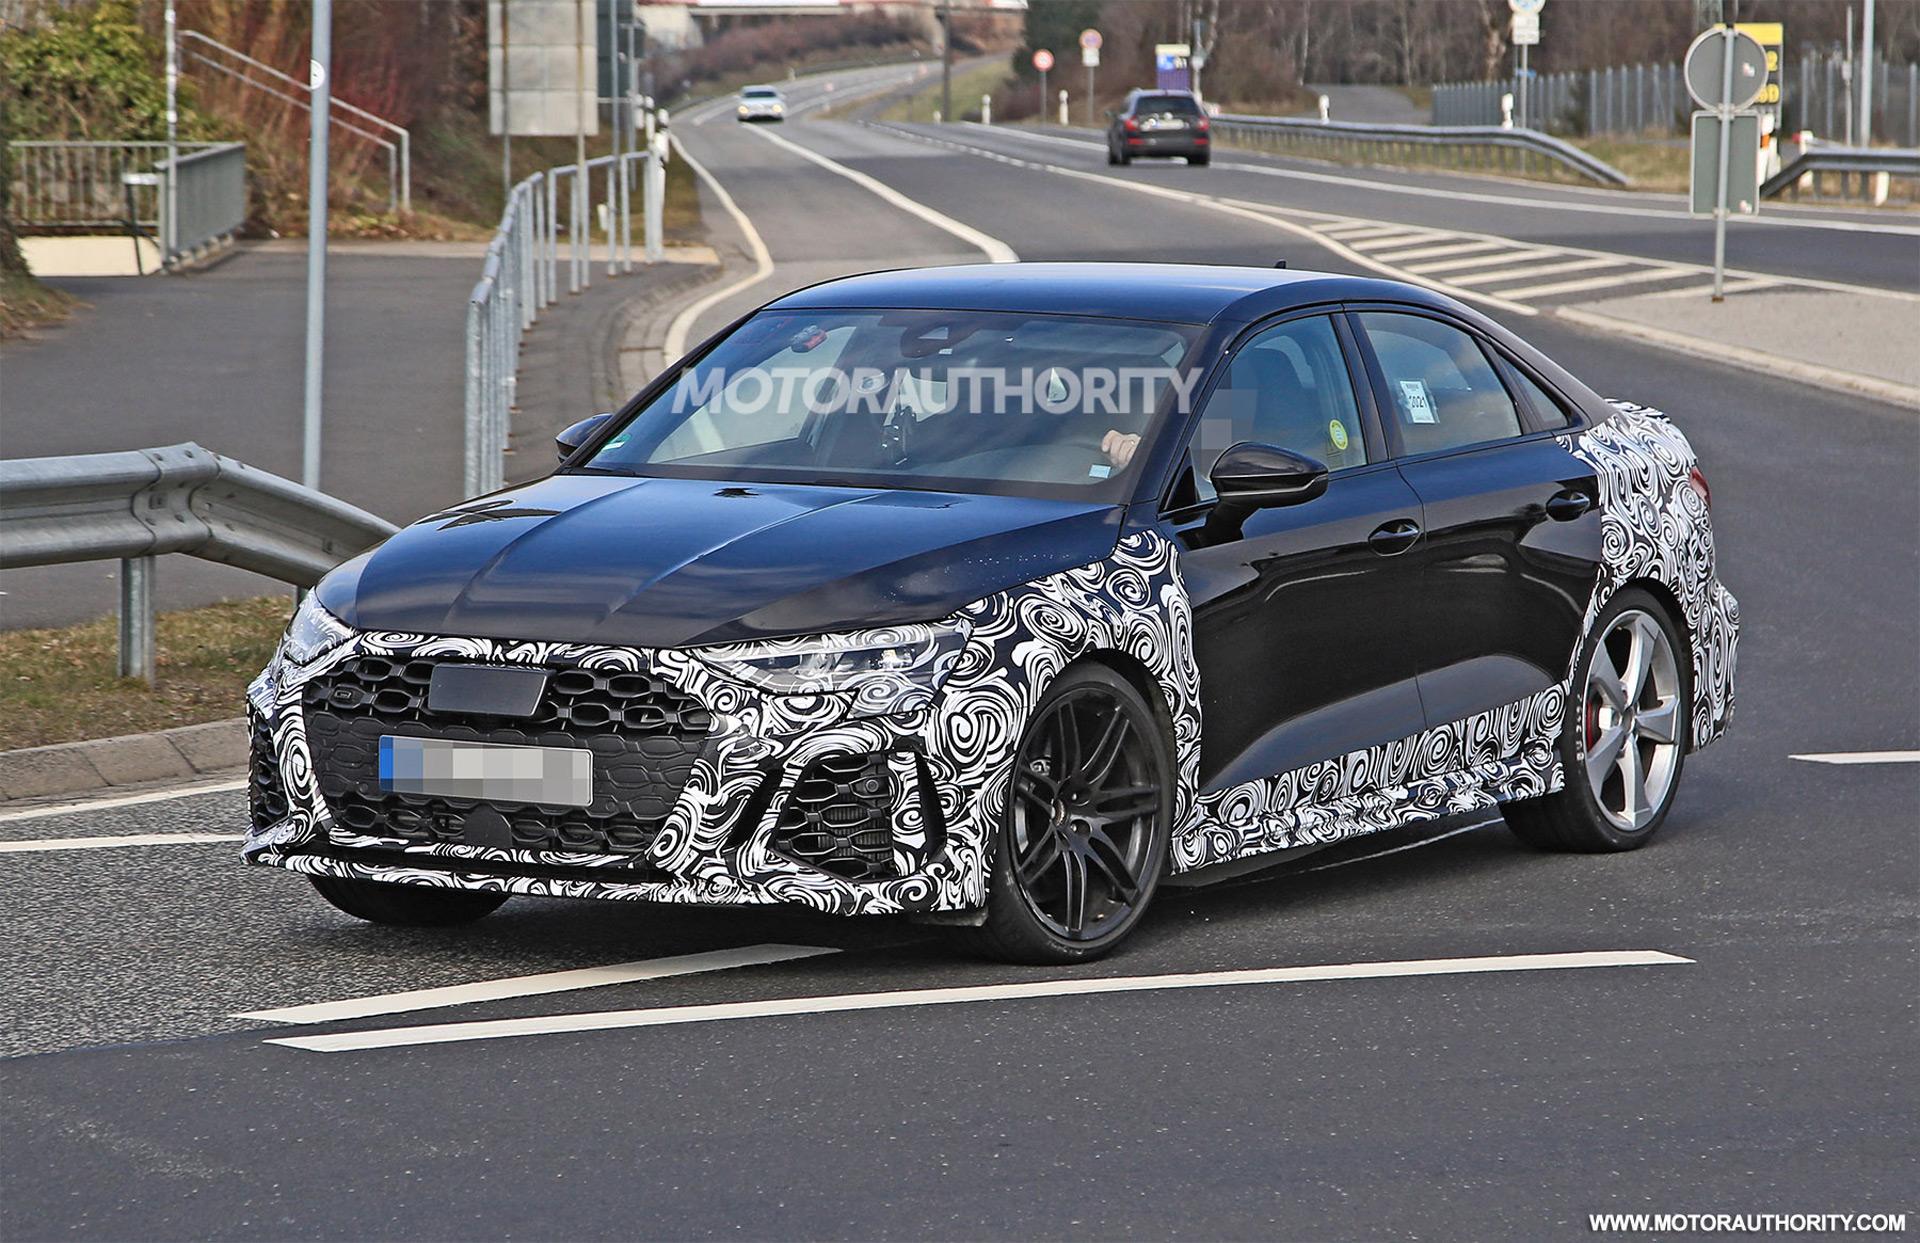 2022 Audi RS 3 spy shots: 400-plus-hp compact sedan coming soon